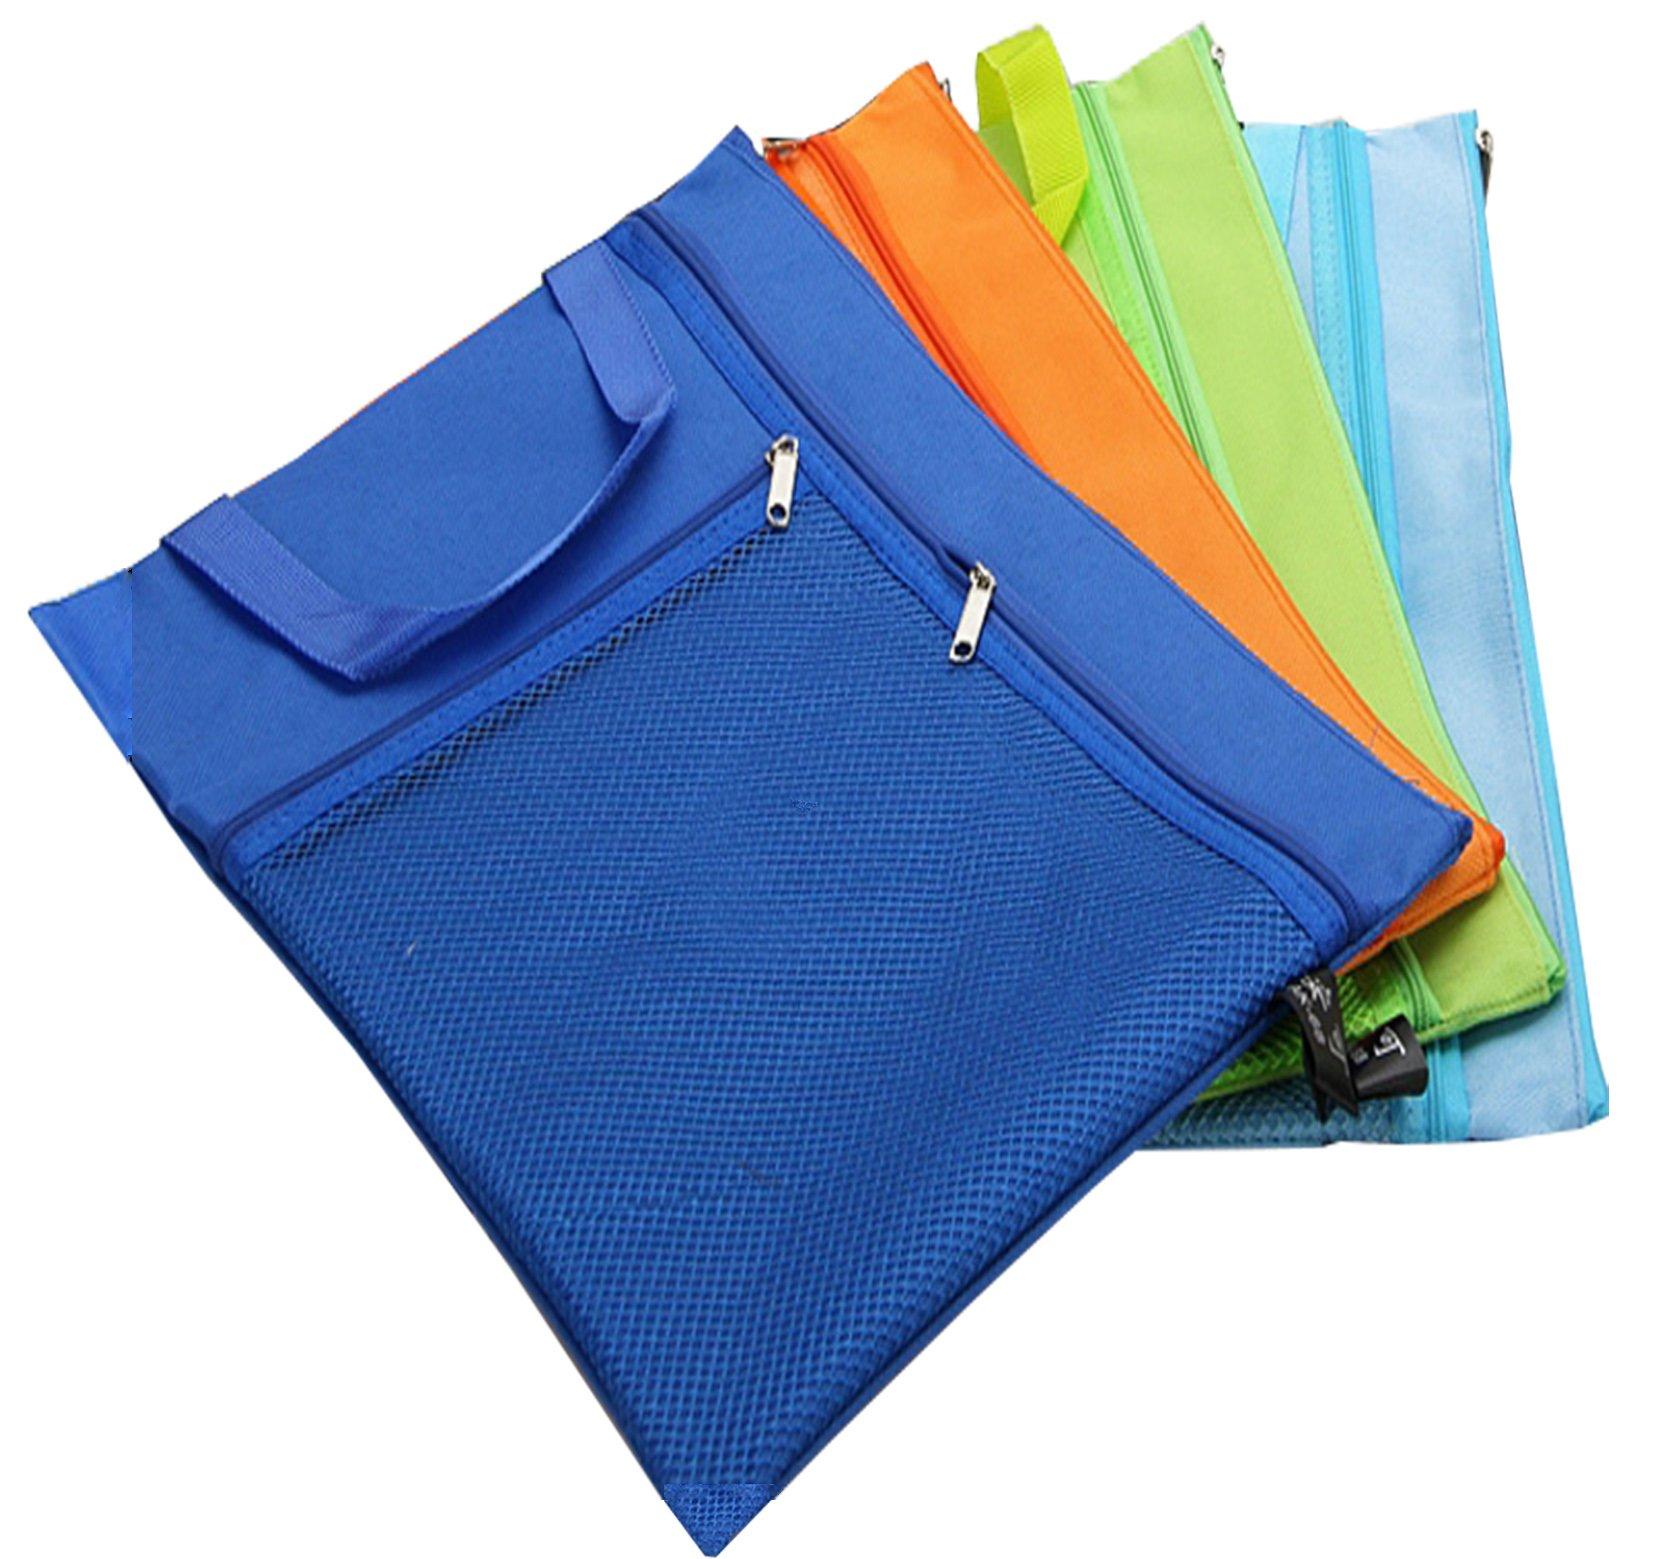 Gorse Expansion Envelope File Bags Canvas Waterproof Zipper Valve Bags Multistory File Folder Pockets Holder for A4 Paper Document Letter Size Picture Color 3 Pcs